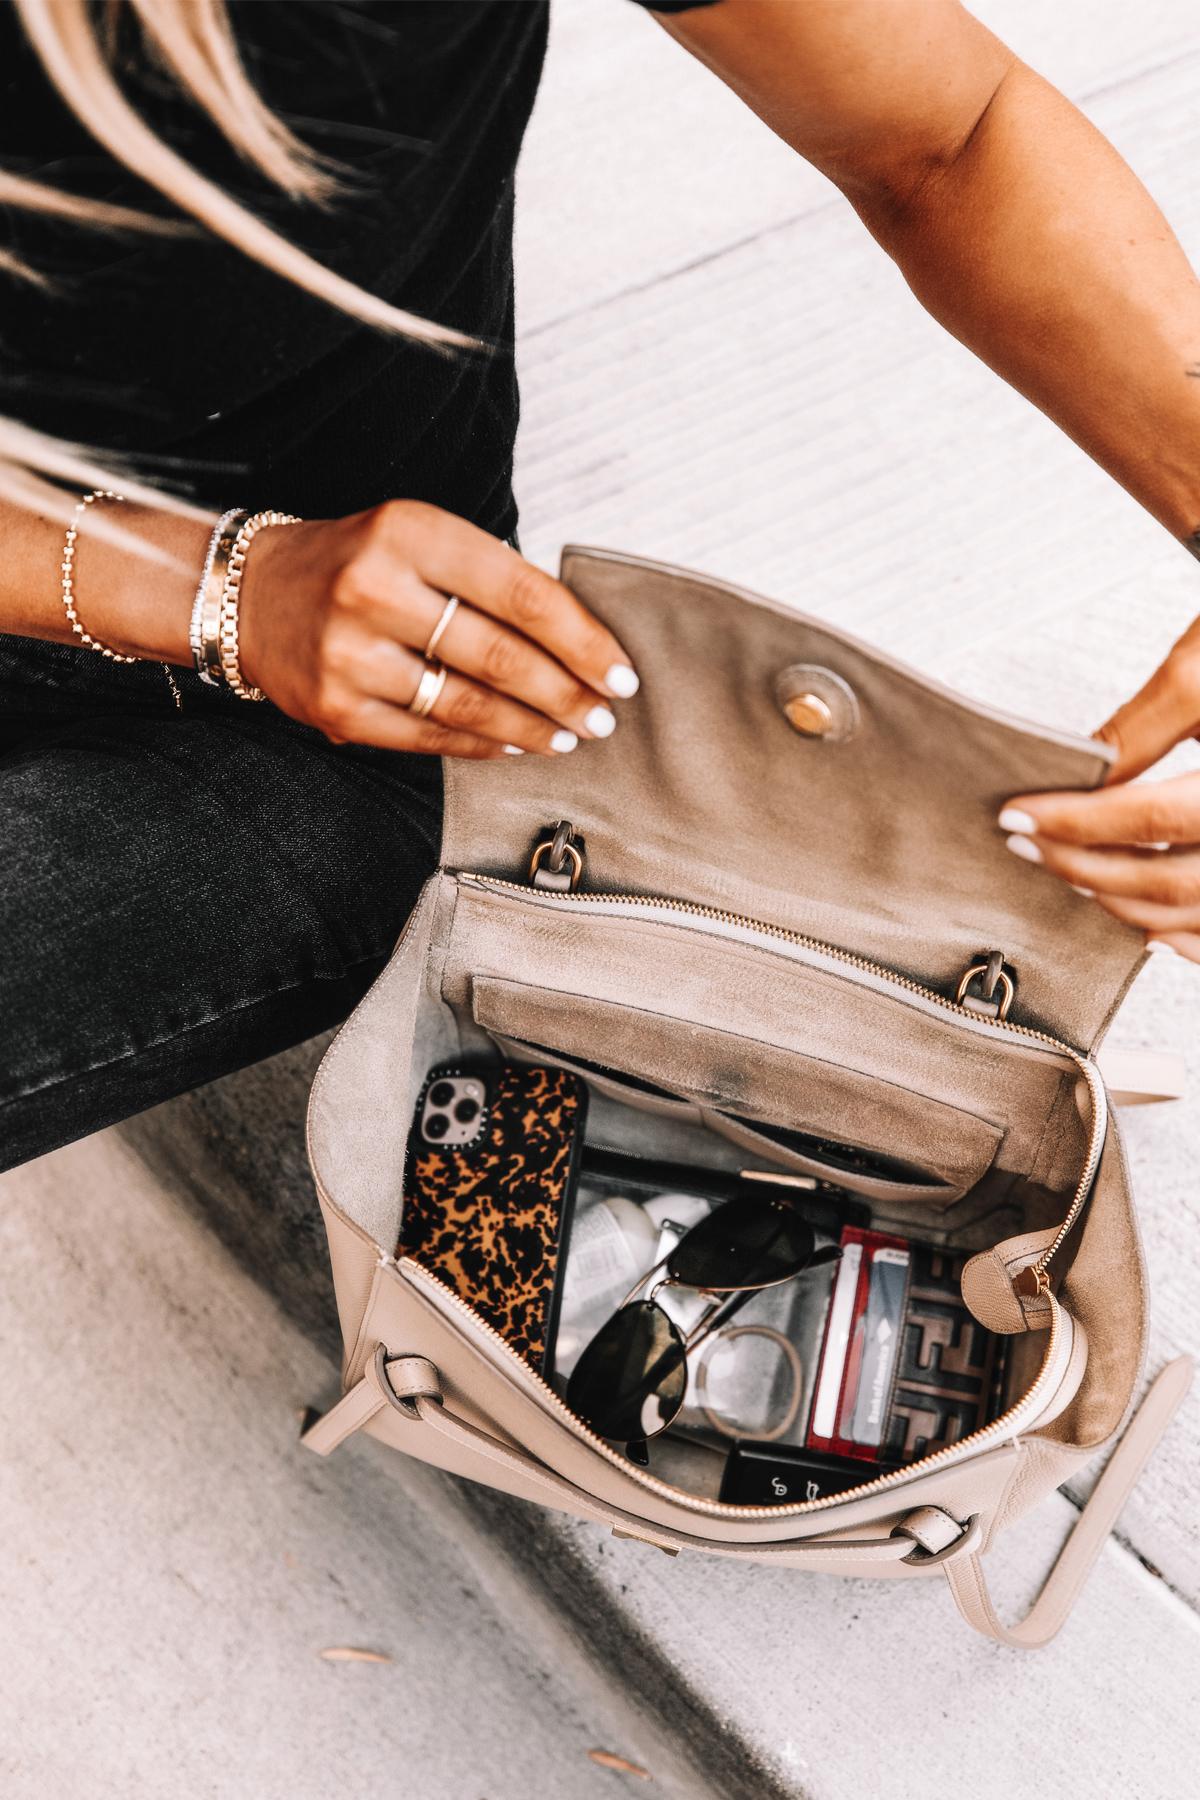 Fashion Jackson Celine Mini Belt Bag Review